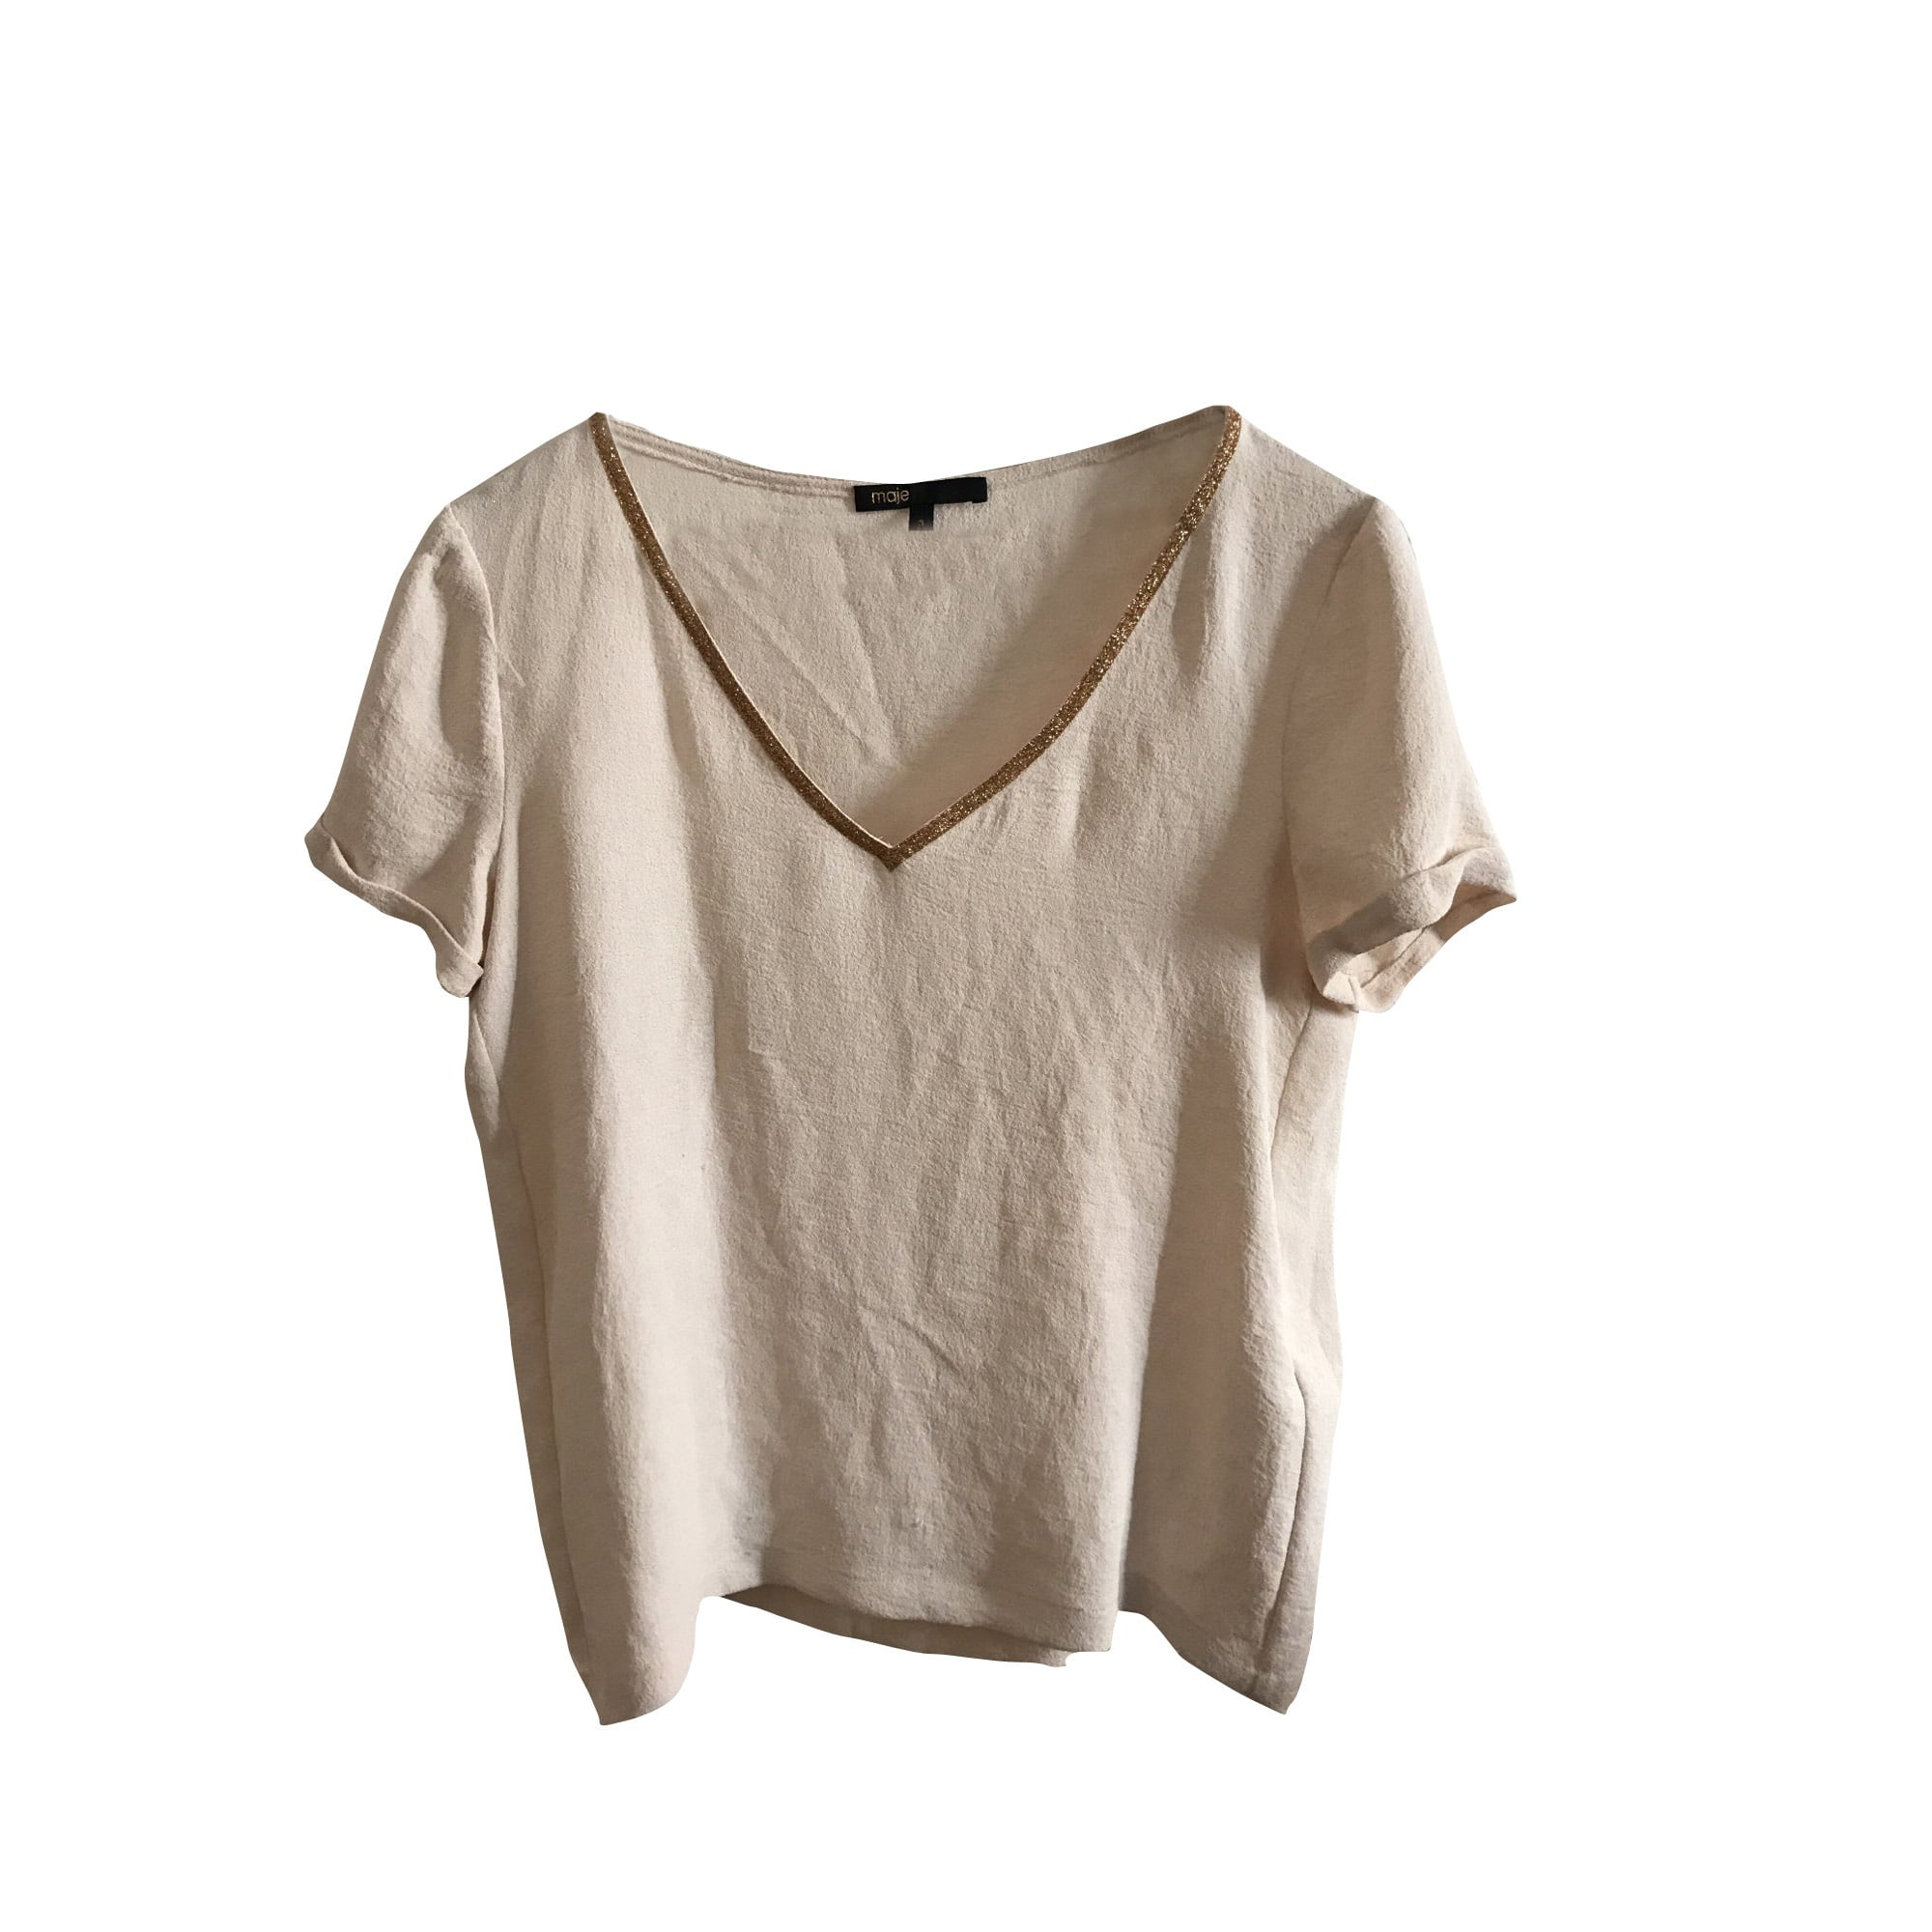 Maje Blouse polyester 40 (L, T3)